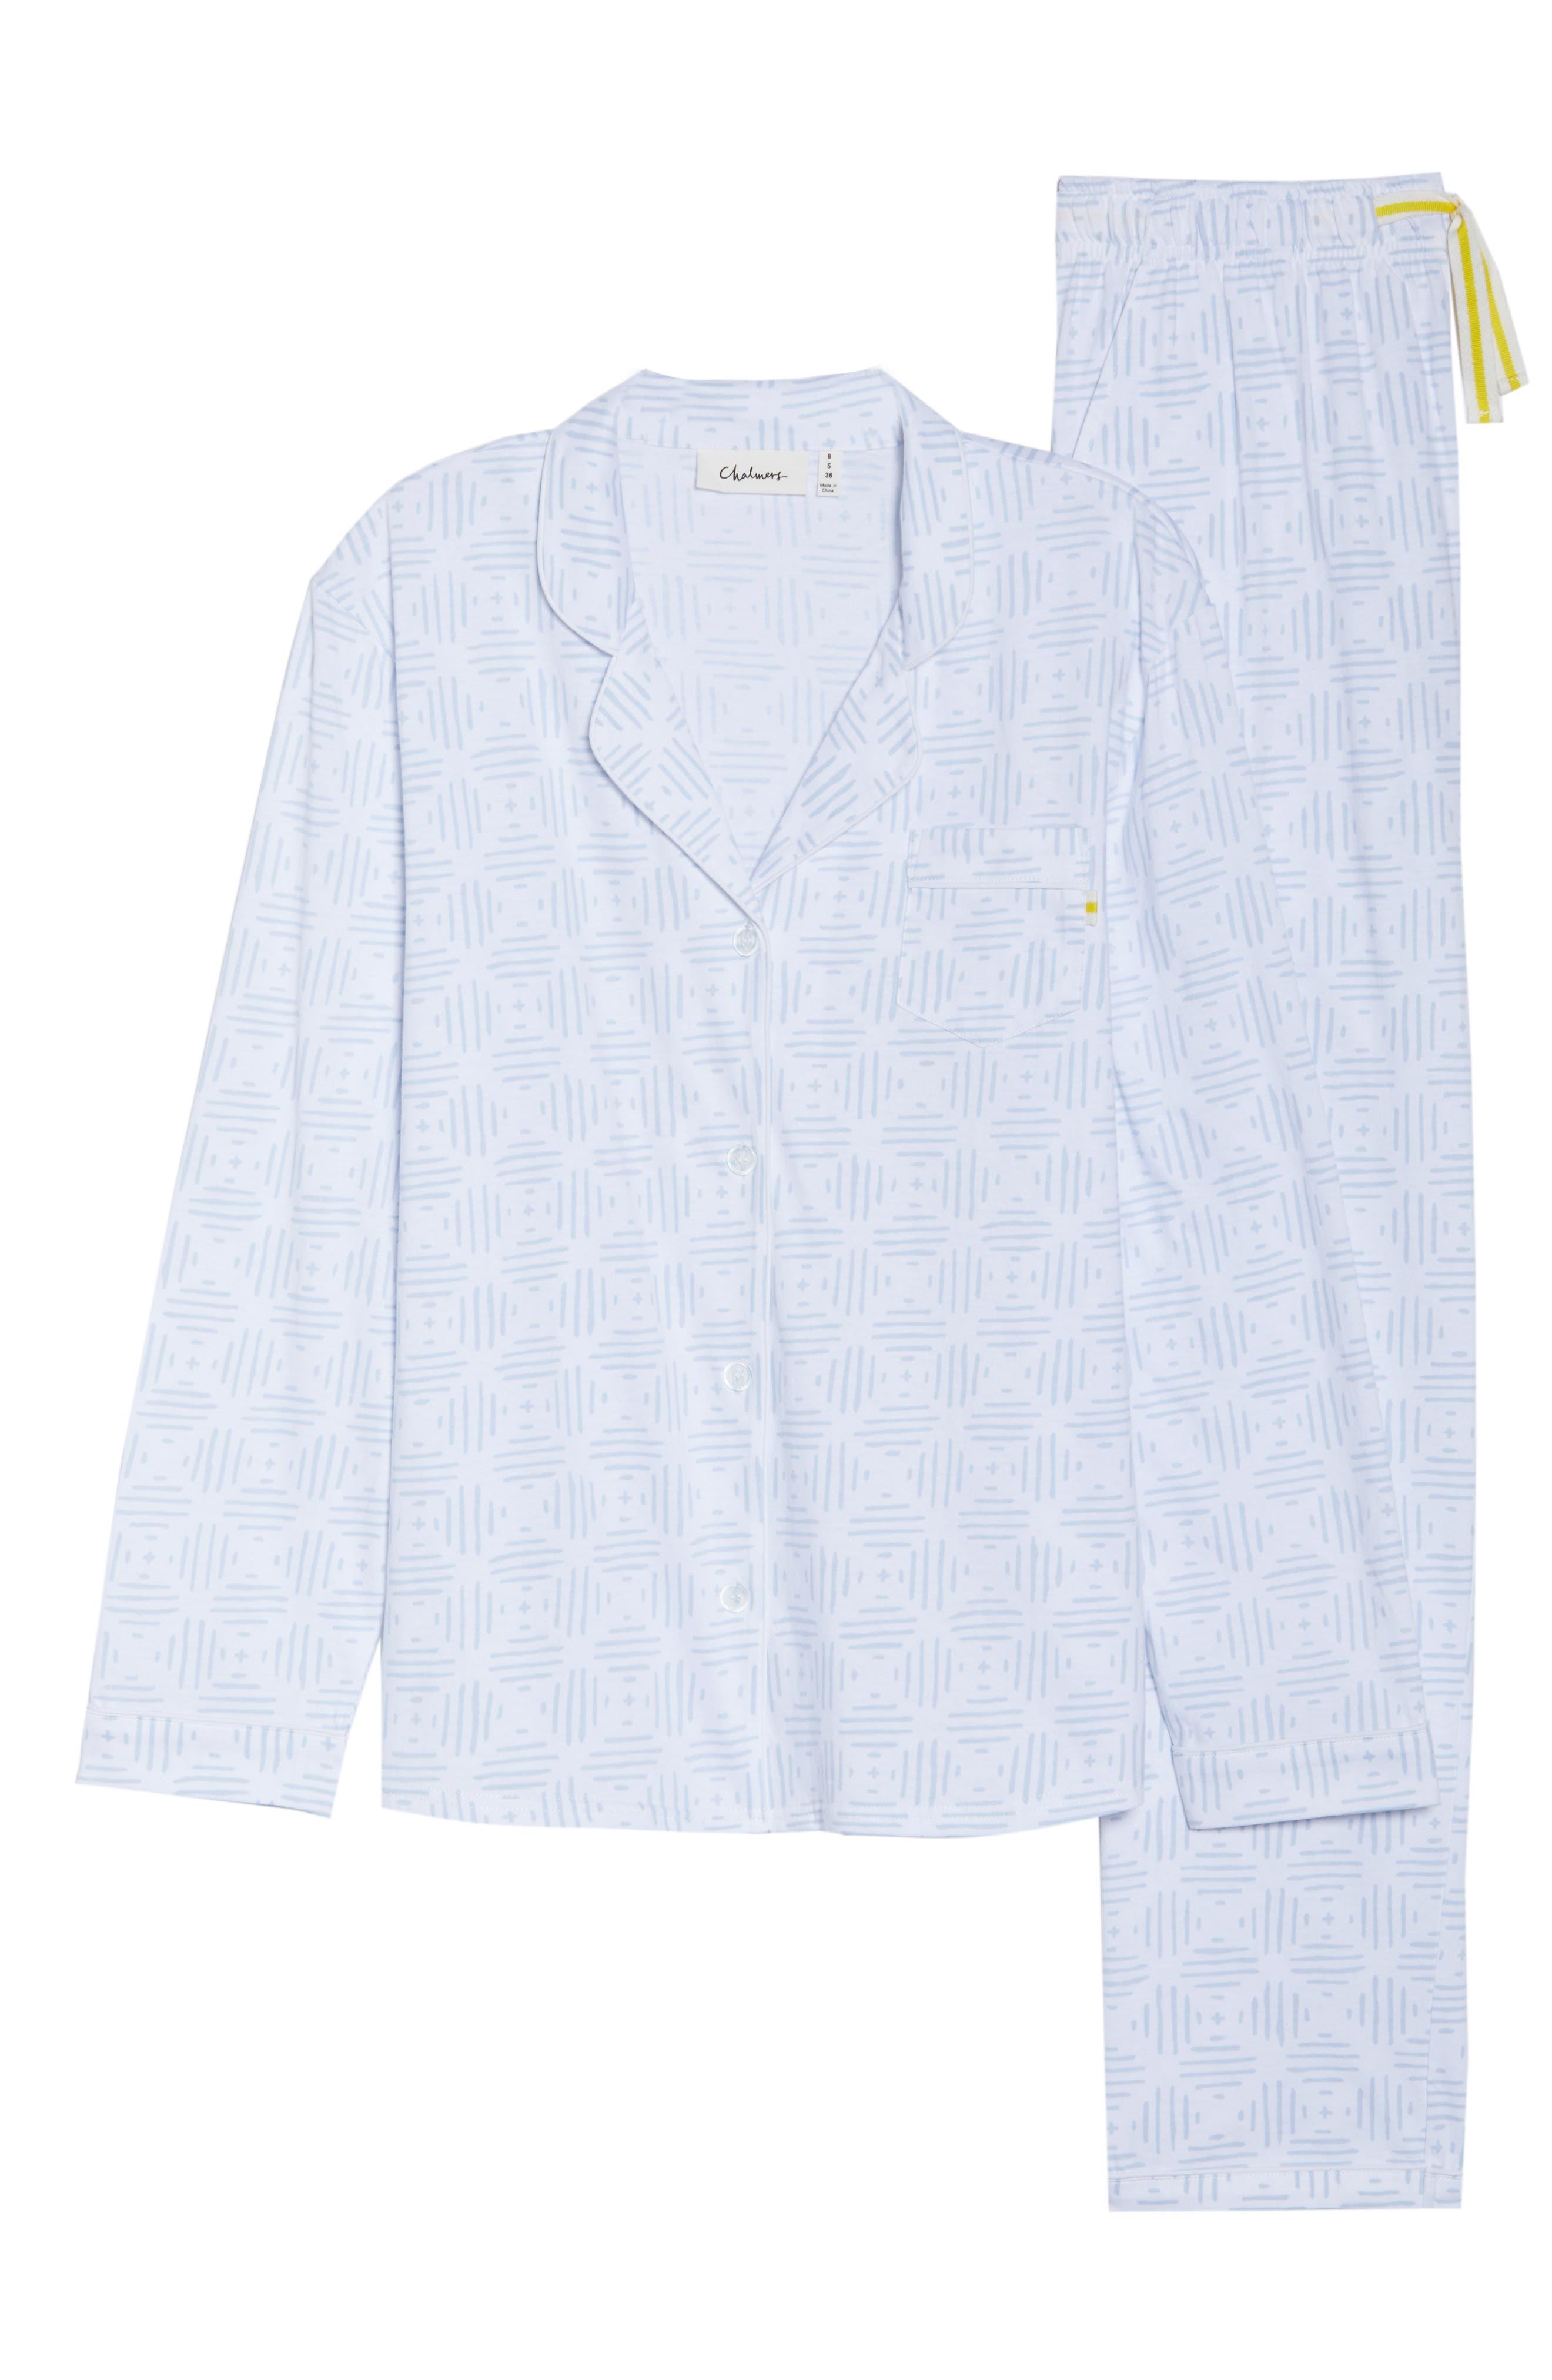 Moroccan Tile Pajamas,                             Alternate thumbnail 6, color,                             100